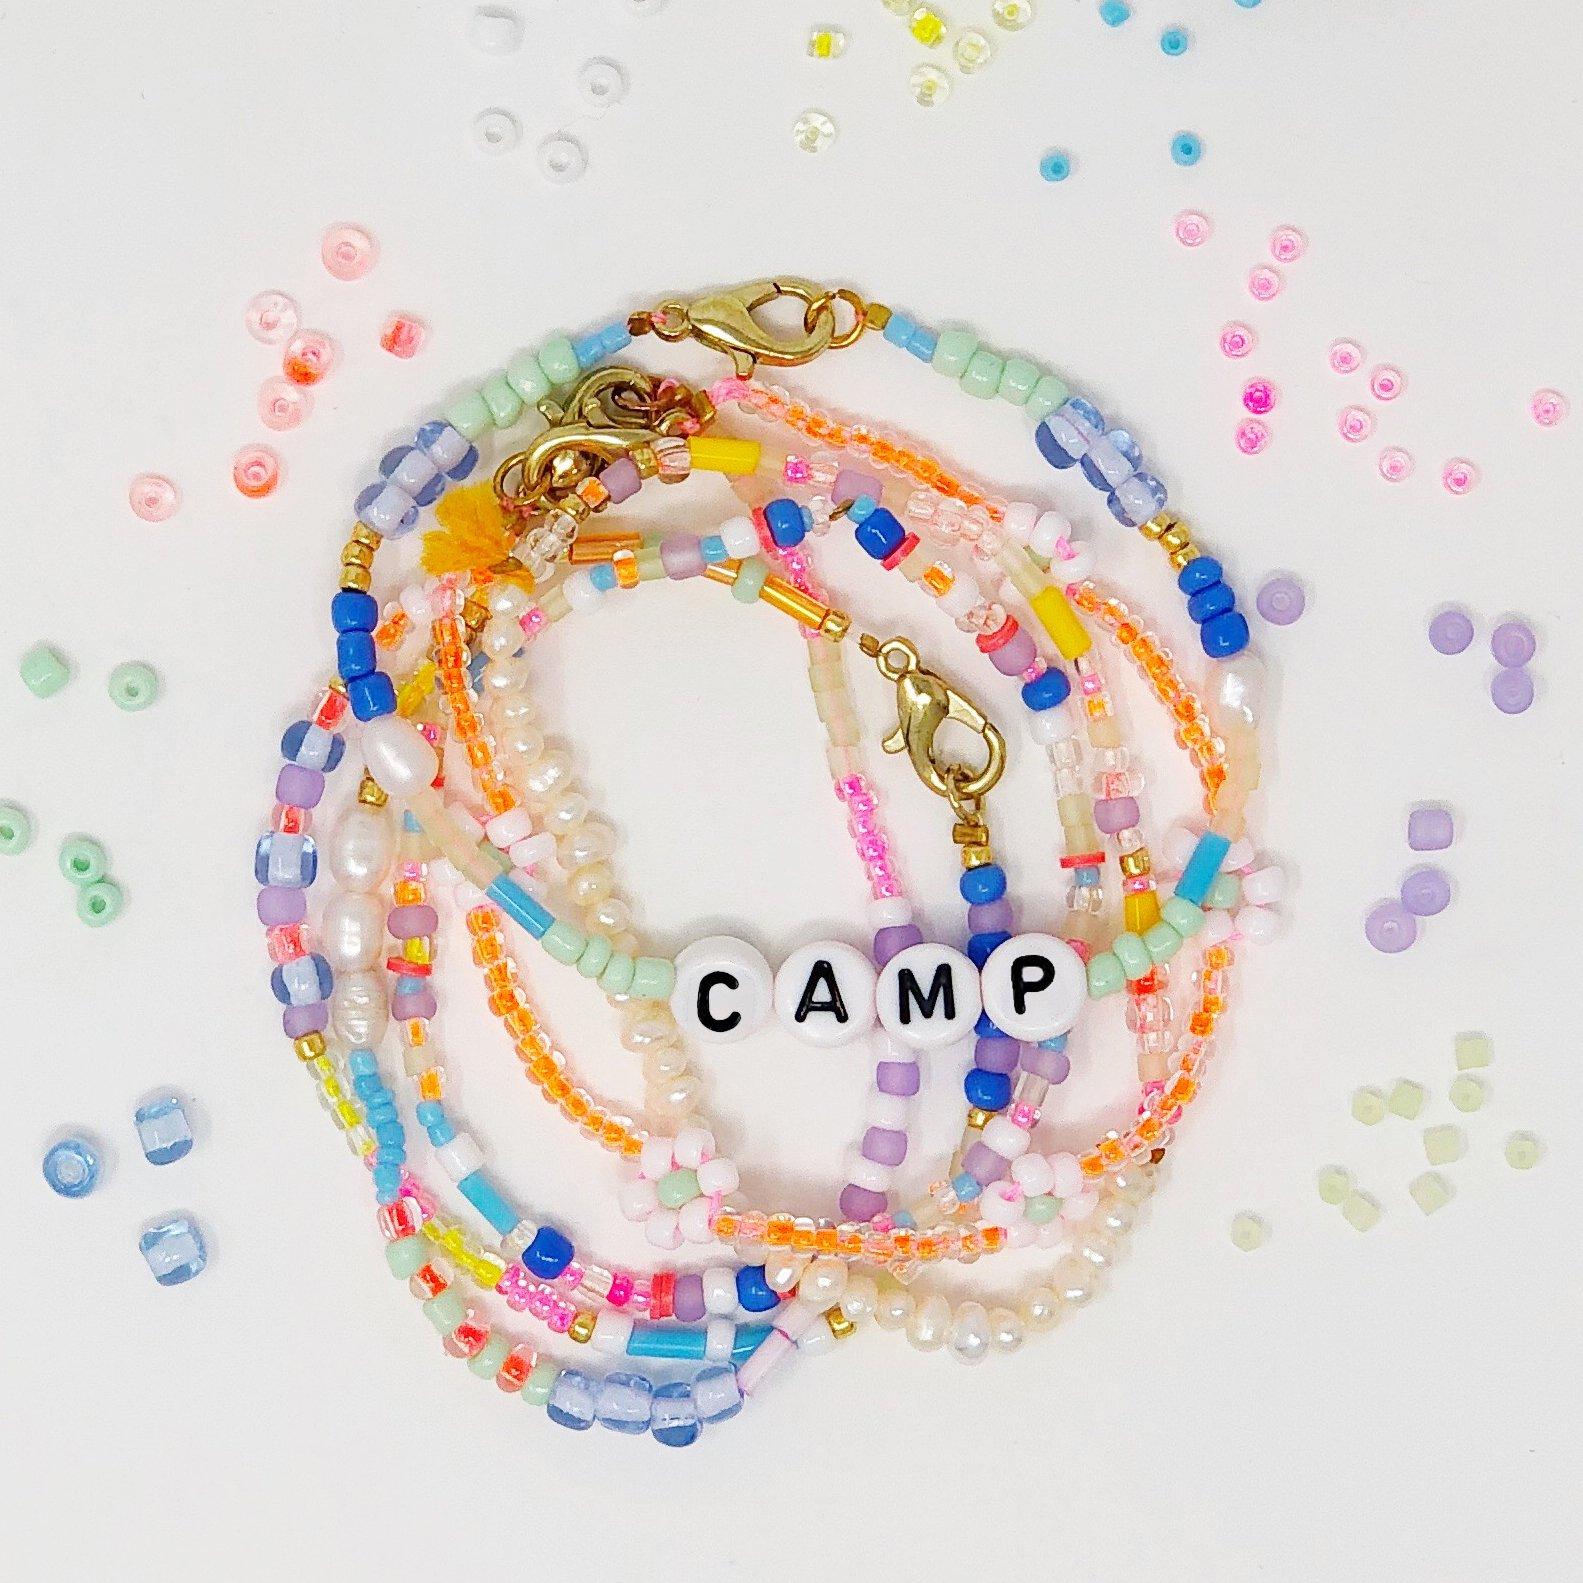 Seed Bead Beaded Bracelets - Camp